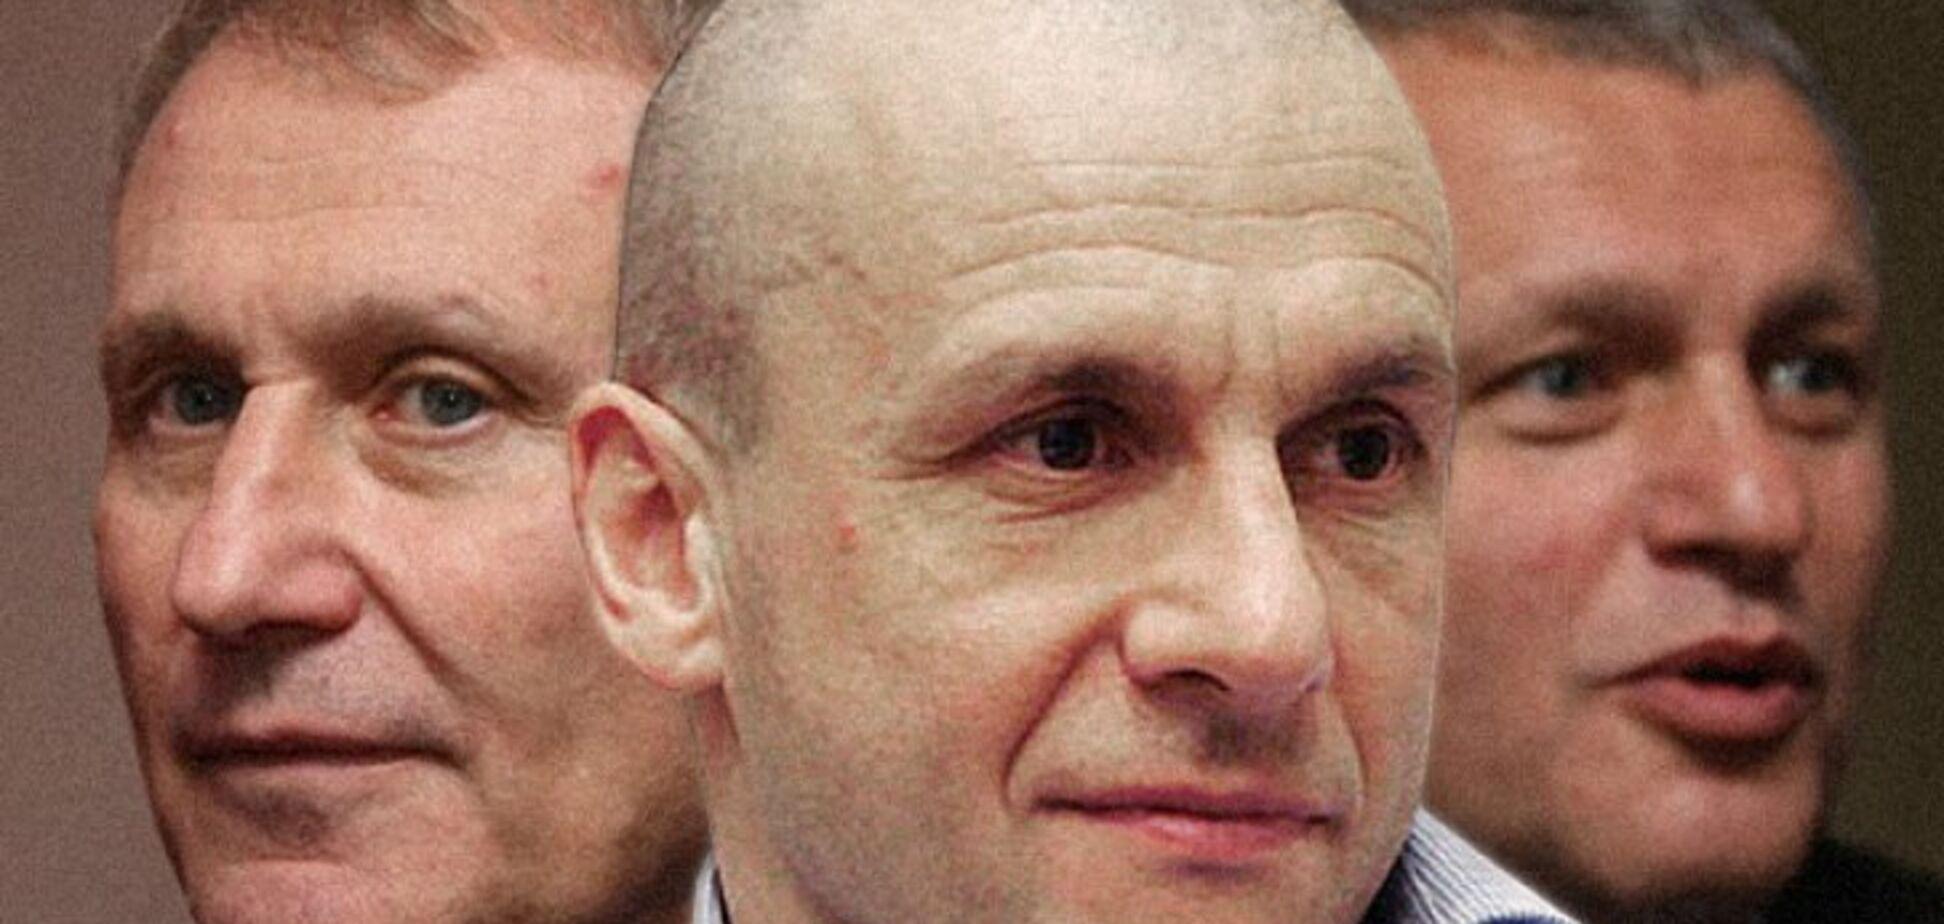 Коломойский, Григоришин и Суркис объявили о переходе на RAB-тарифы